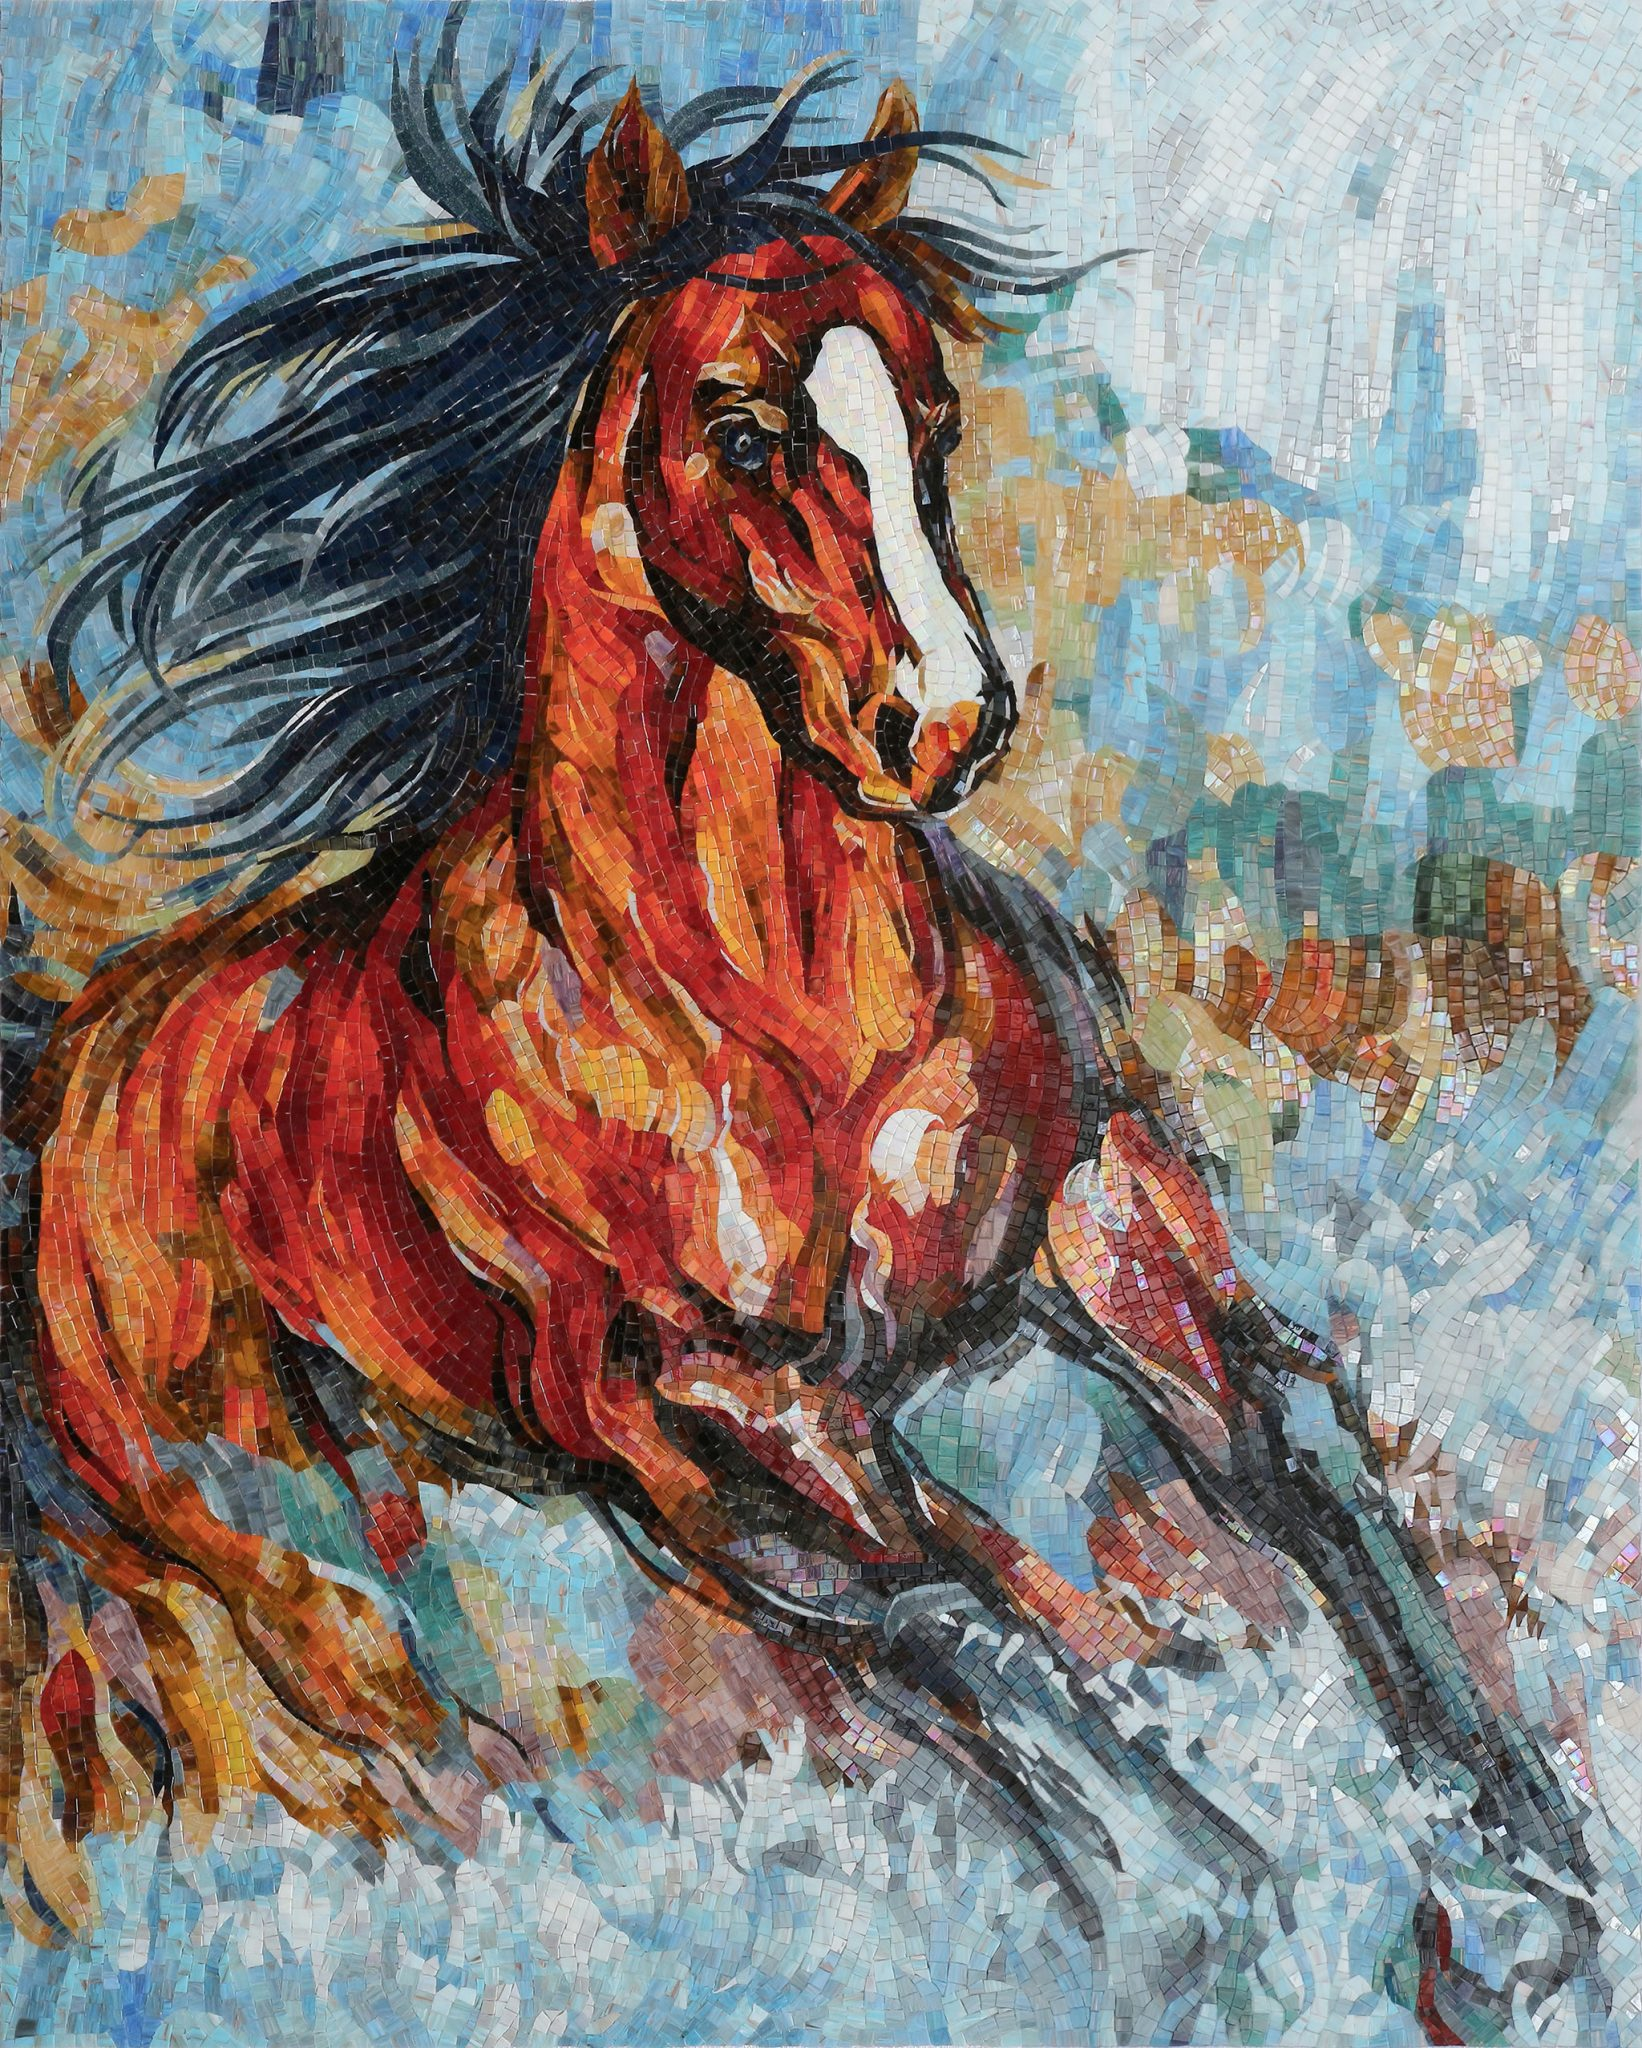 Horse Mosaic Mural by Mosaics Lab